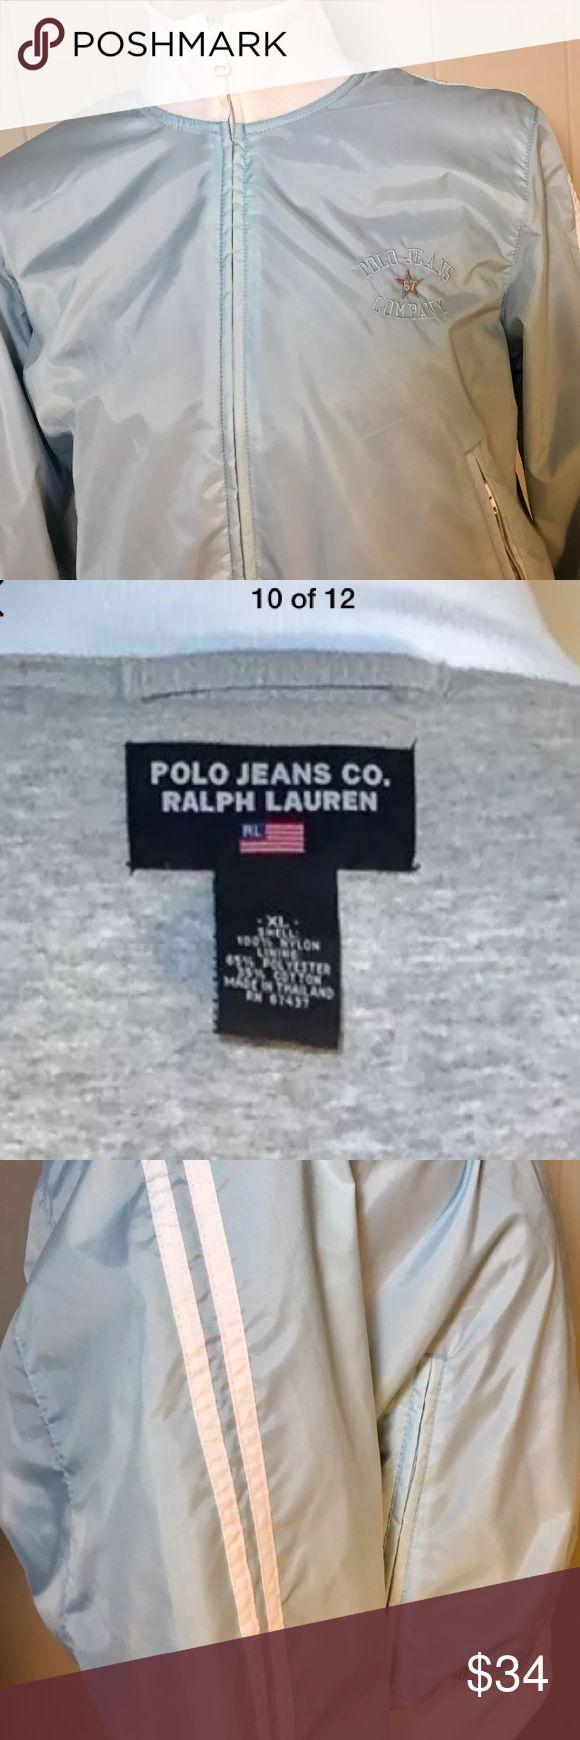 Polo Jean Co. Ralph Lauren Girls XL Lined Jacket. Polo Jeans Co. Ralph Lauren.Girls Jersey Lined Jacket. Zippered side pockets. Never worn. Polo Jeans Co. Ralph Lauren Jackets & Coats